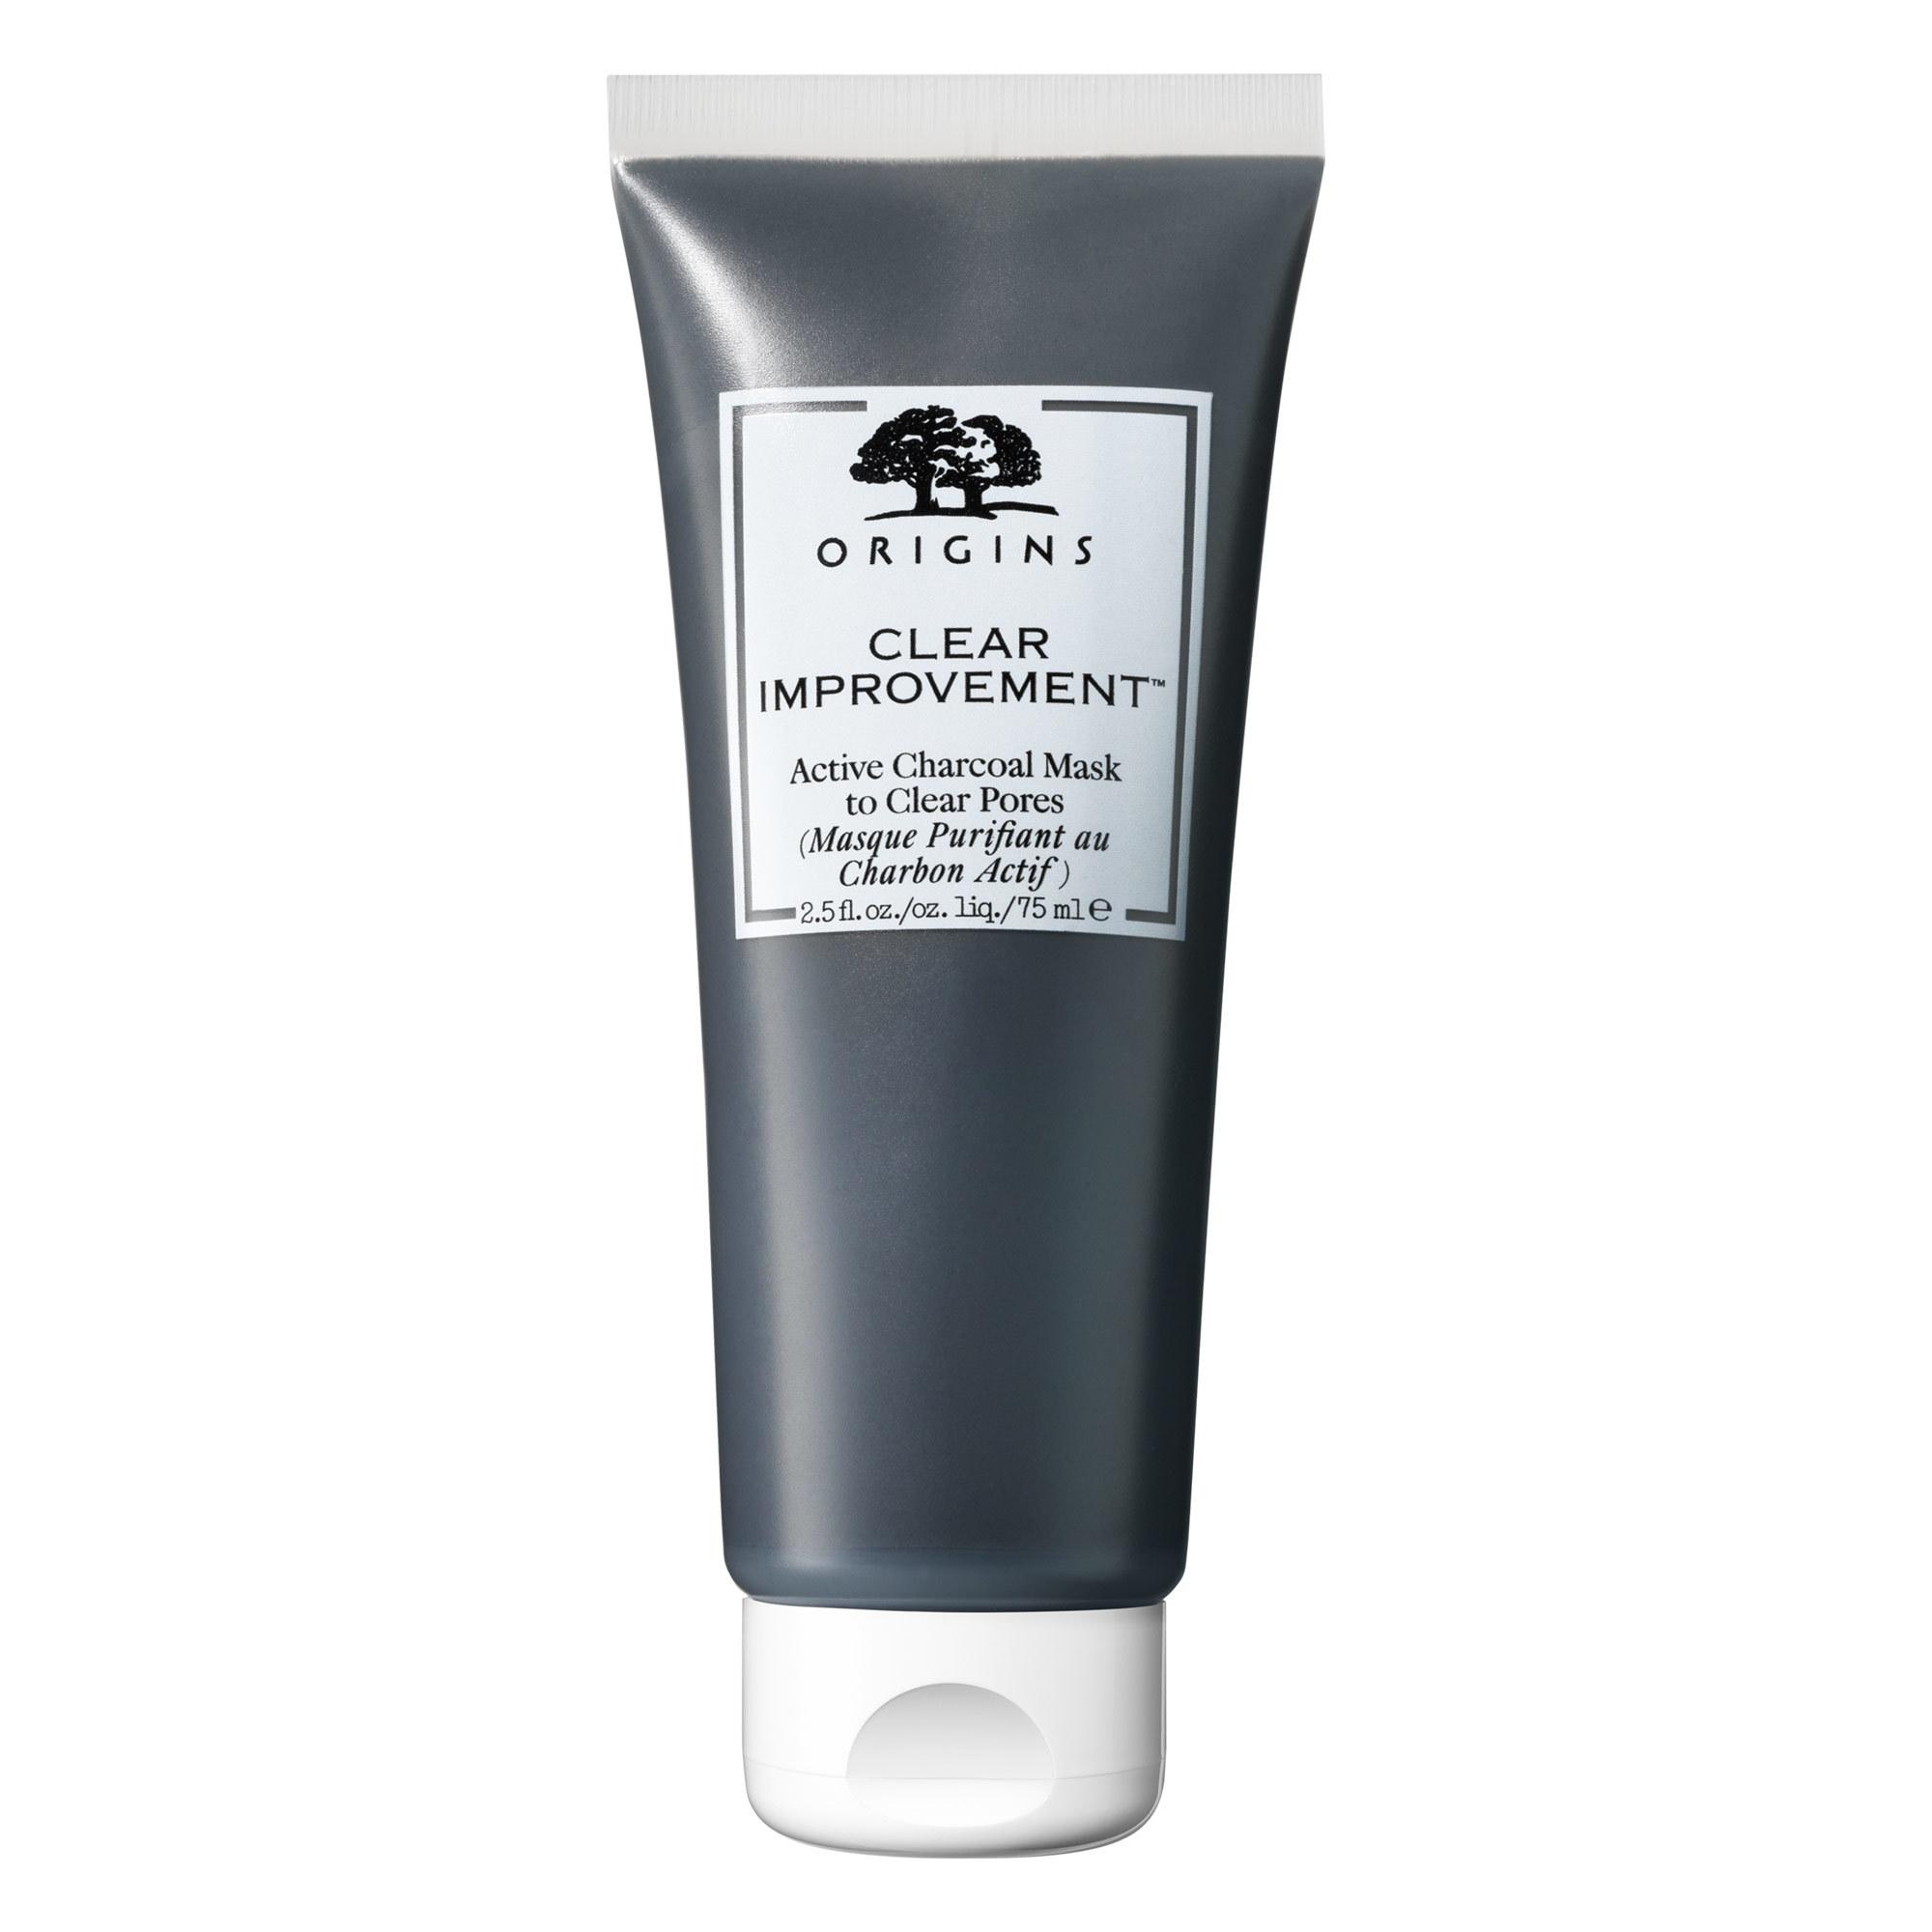 Origins Clear Improvement Charcoal Mask, 75 ml